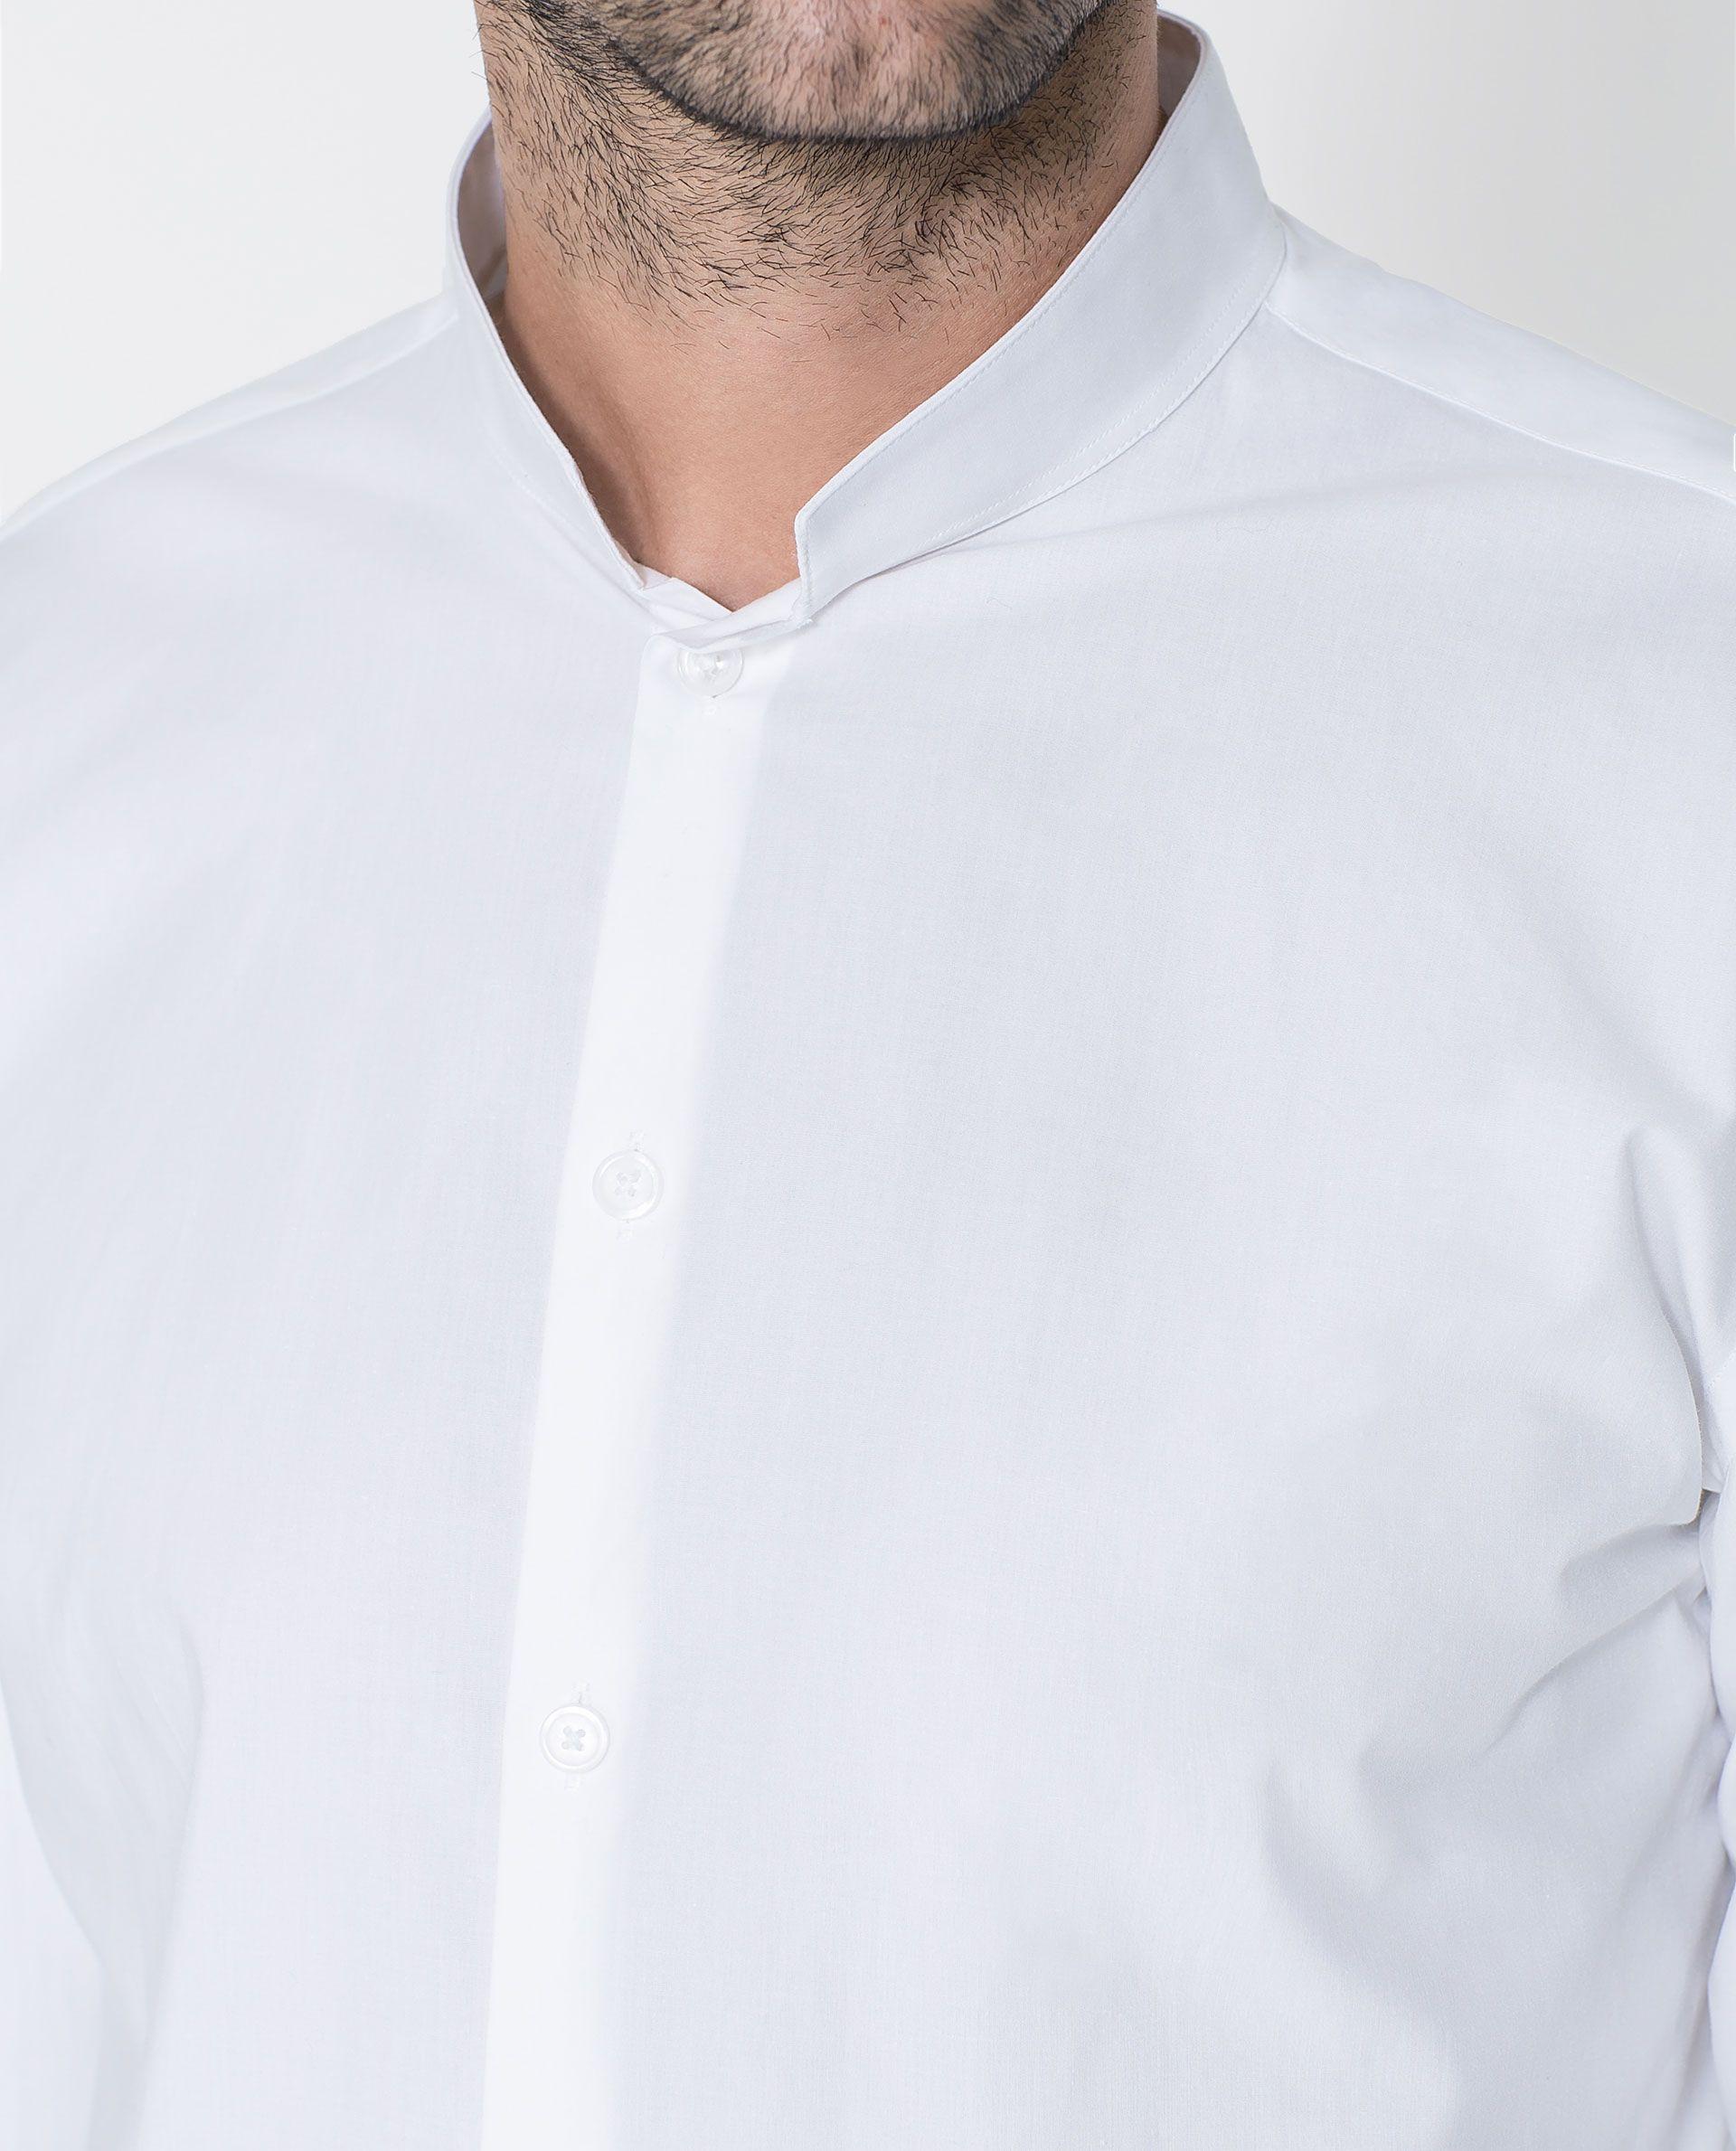 Zara flannel shirt mens  CAMISA POPELÍN  Camisas  Hombre  ZARA España  Camisas  Pinterest